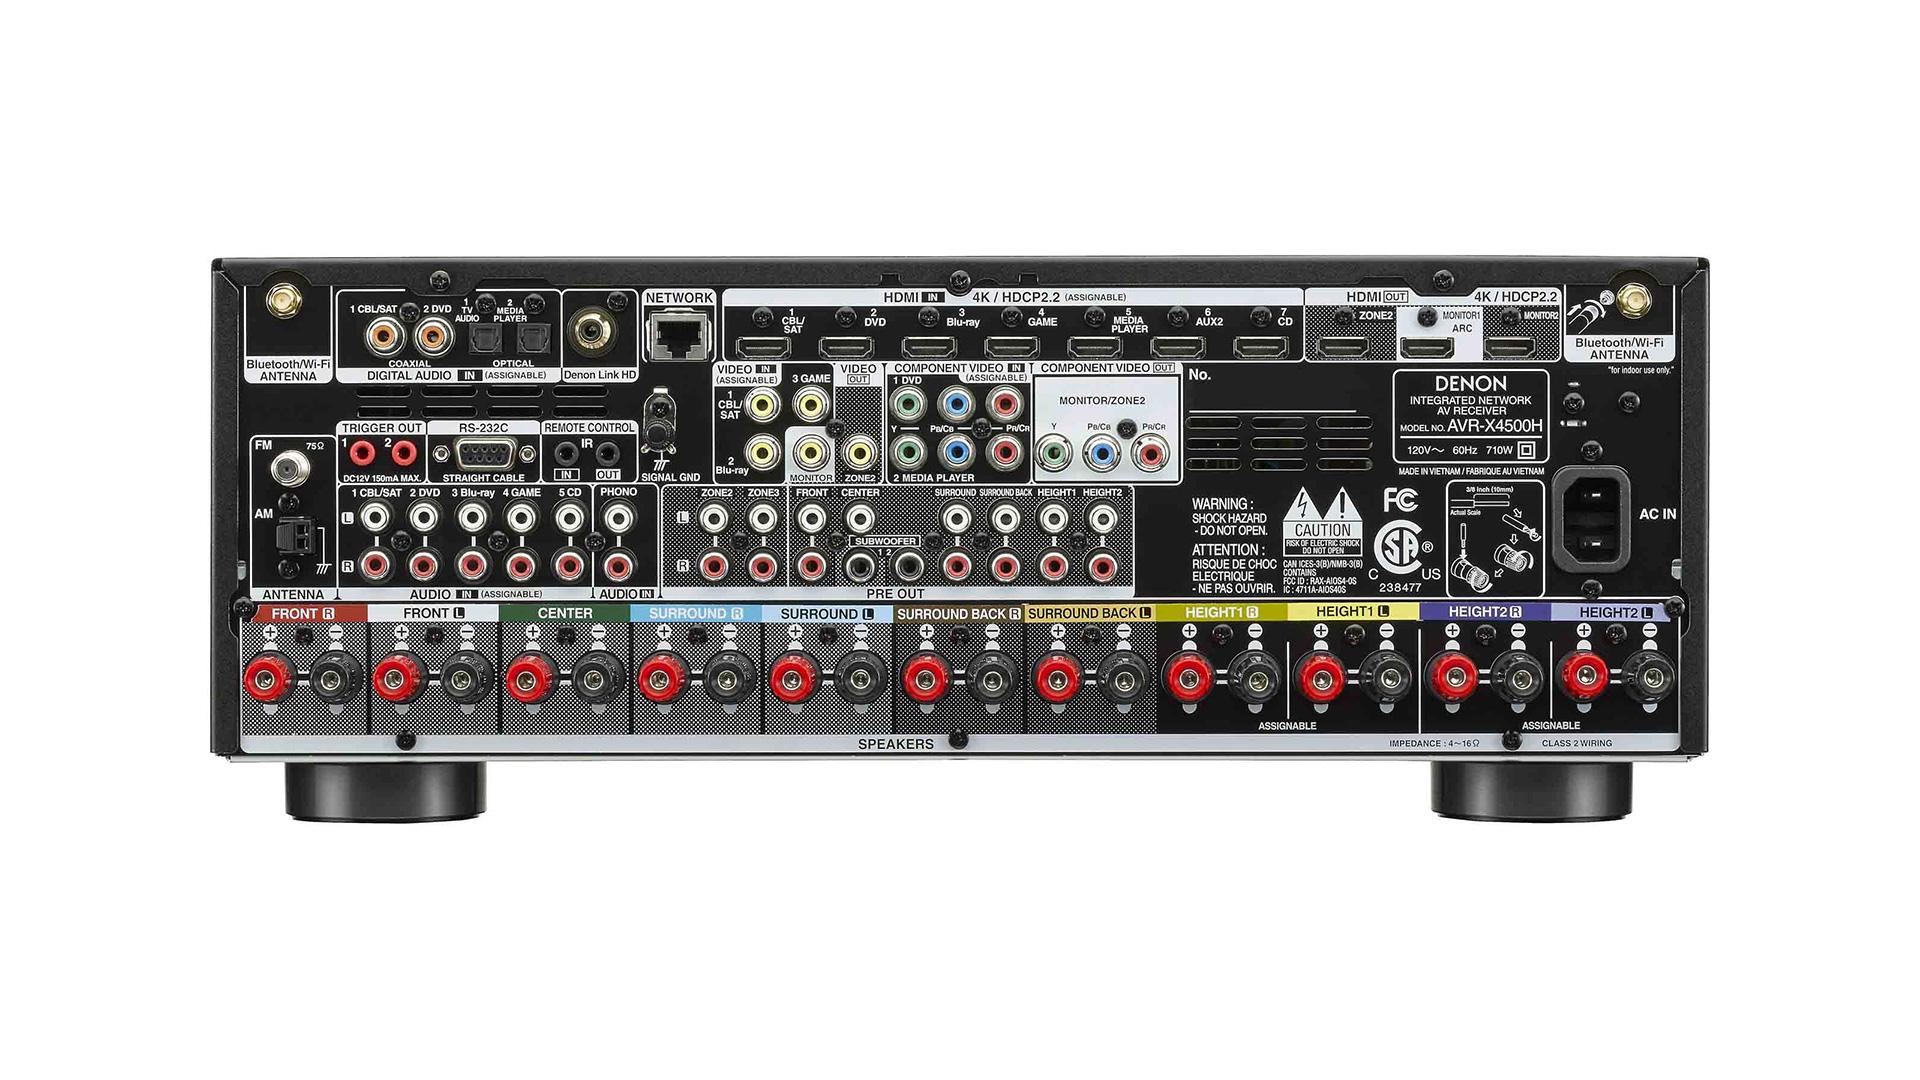 Denon AVR-X4500H AV Surround Receiver (Back) at Creative Audio in Winnipeg